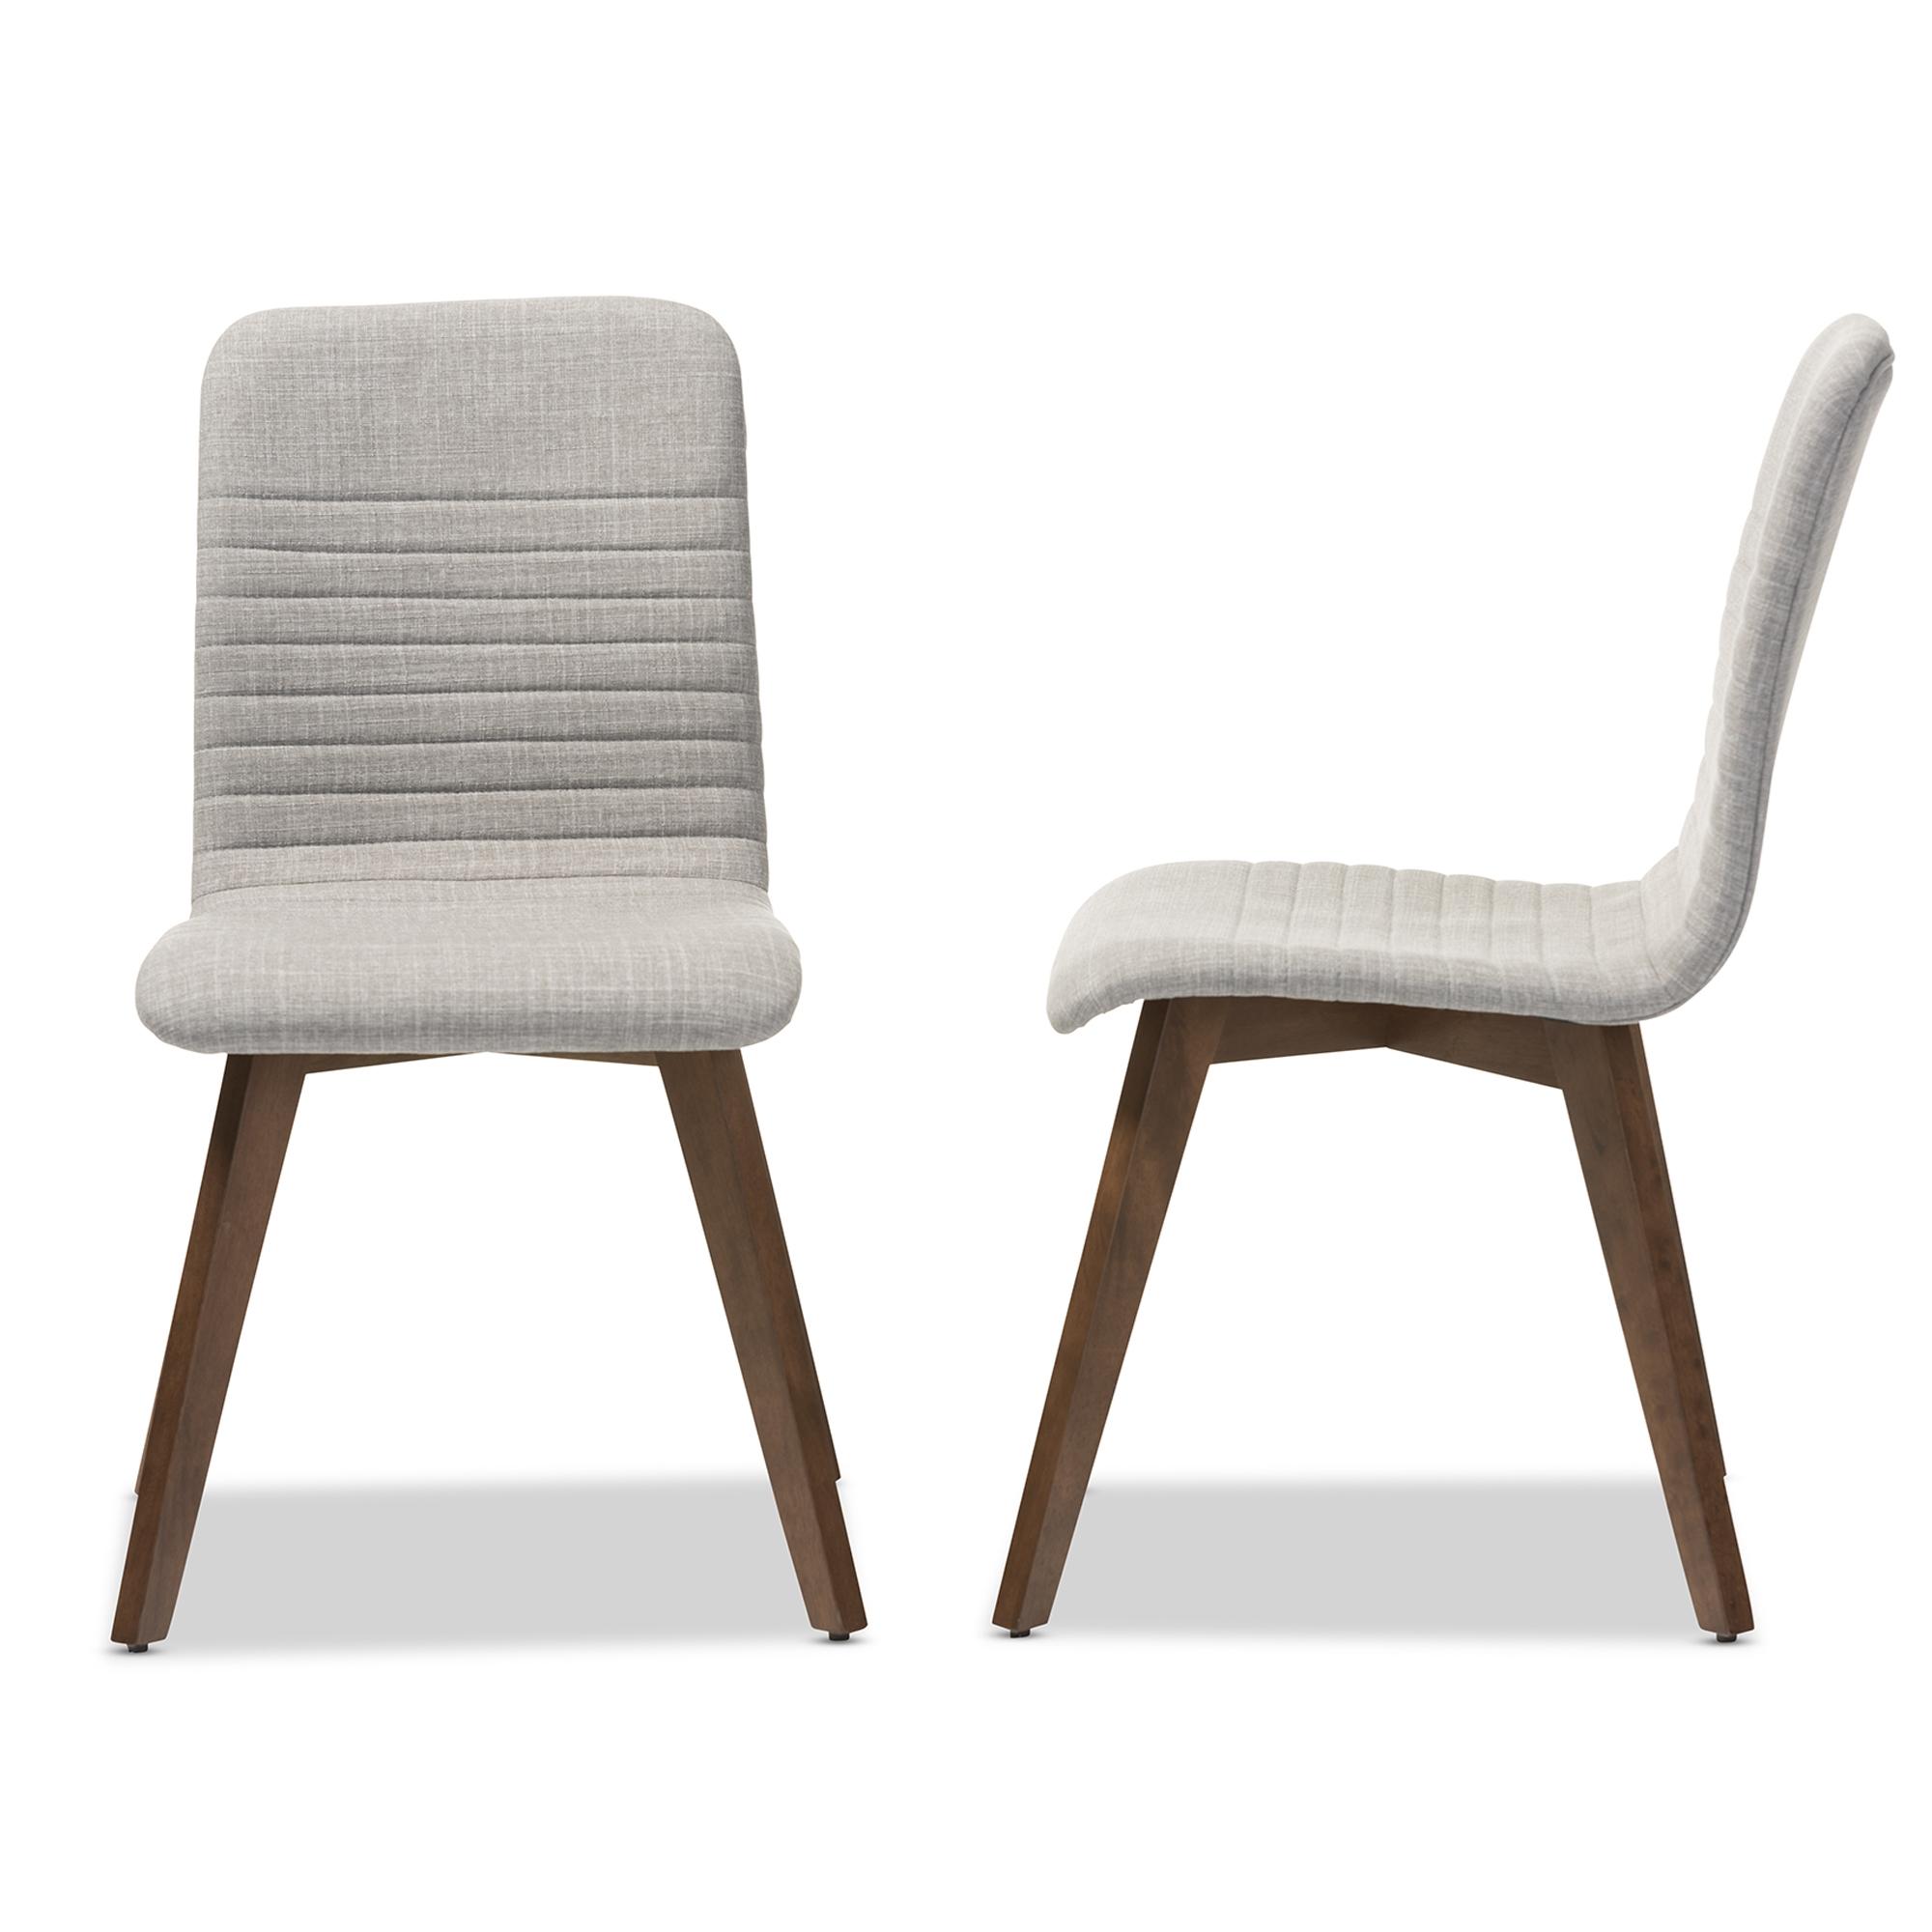 Baxton Studio | Wholesale Dining Chairs | Wholesale Dining Room Furniture |  Wholesale Furniture